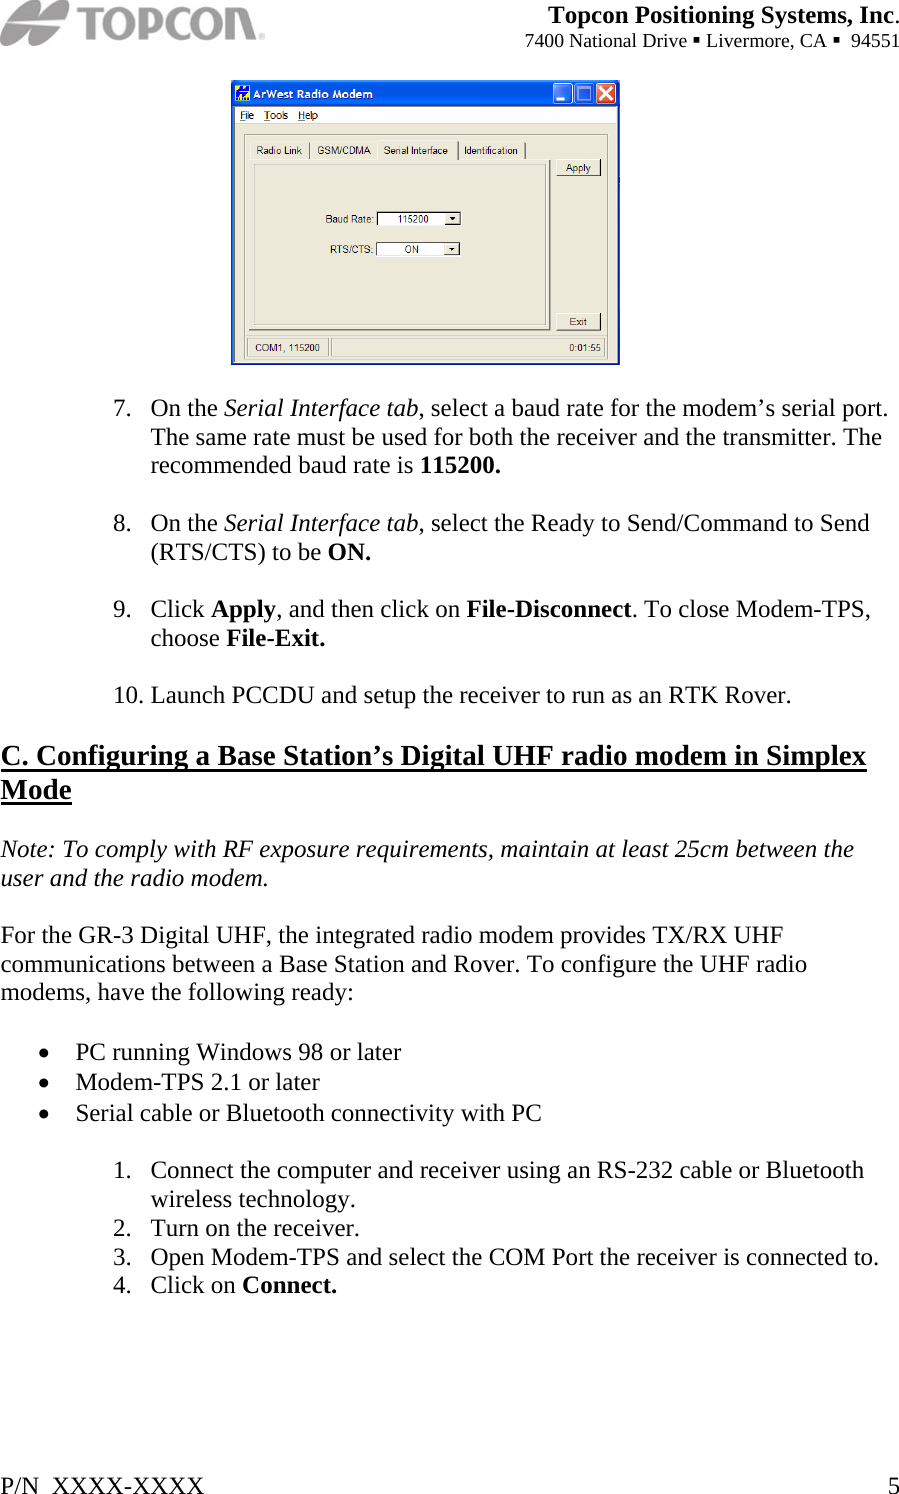 Topcon America 050902 GR 3, 01-050901-22 User Manual Installation Manual